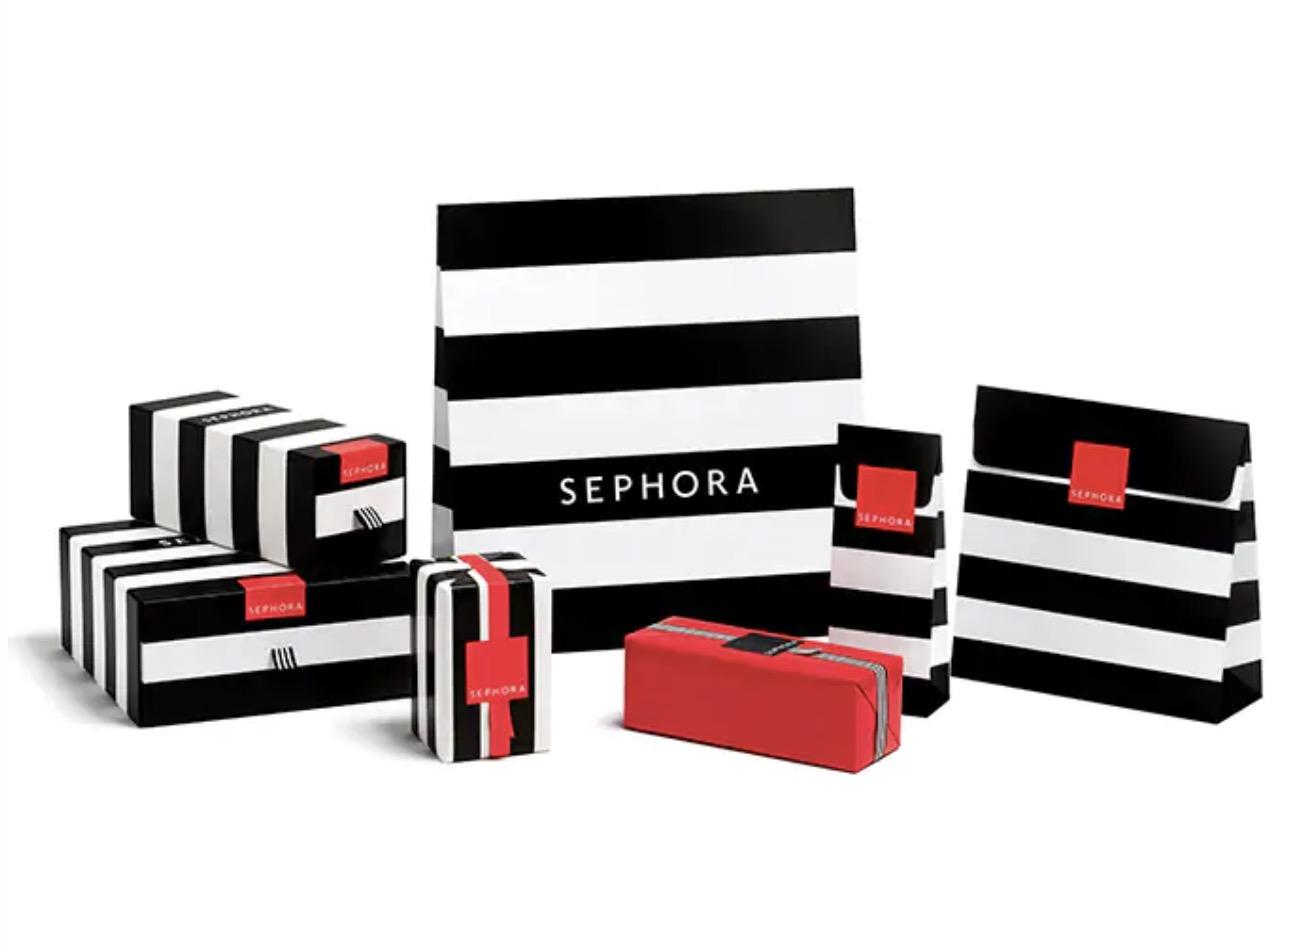 Code promo Sephora : [Gift Factory] 1 emballage cadeau offert pour toute commande